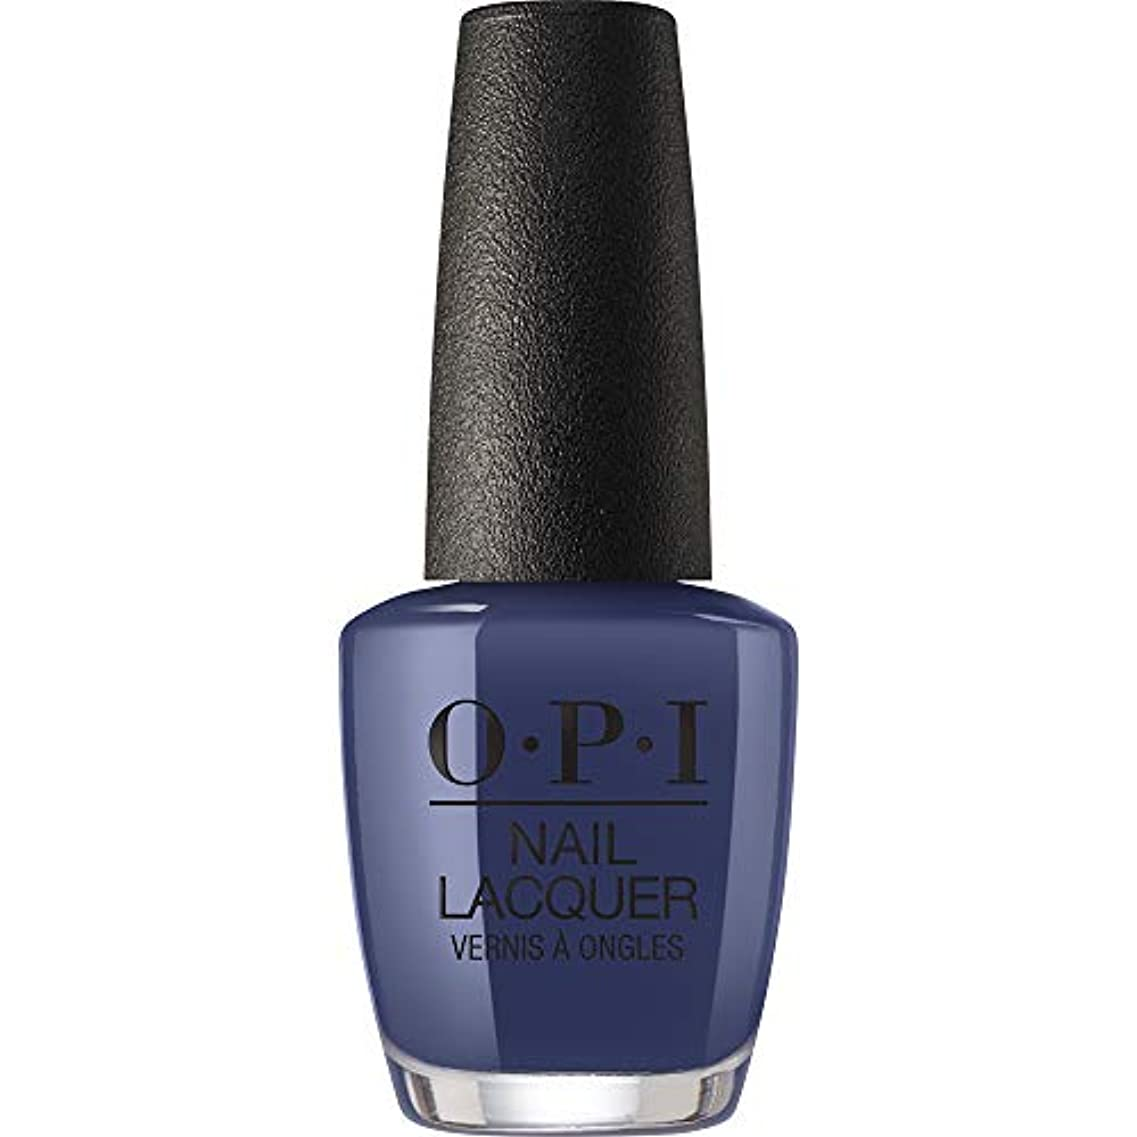 OPI(オーピーアイ) NLU21 ナイス セット オブ パイプス